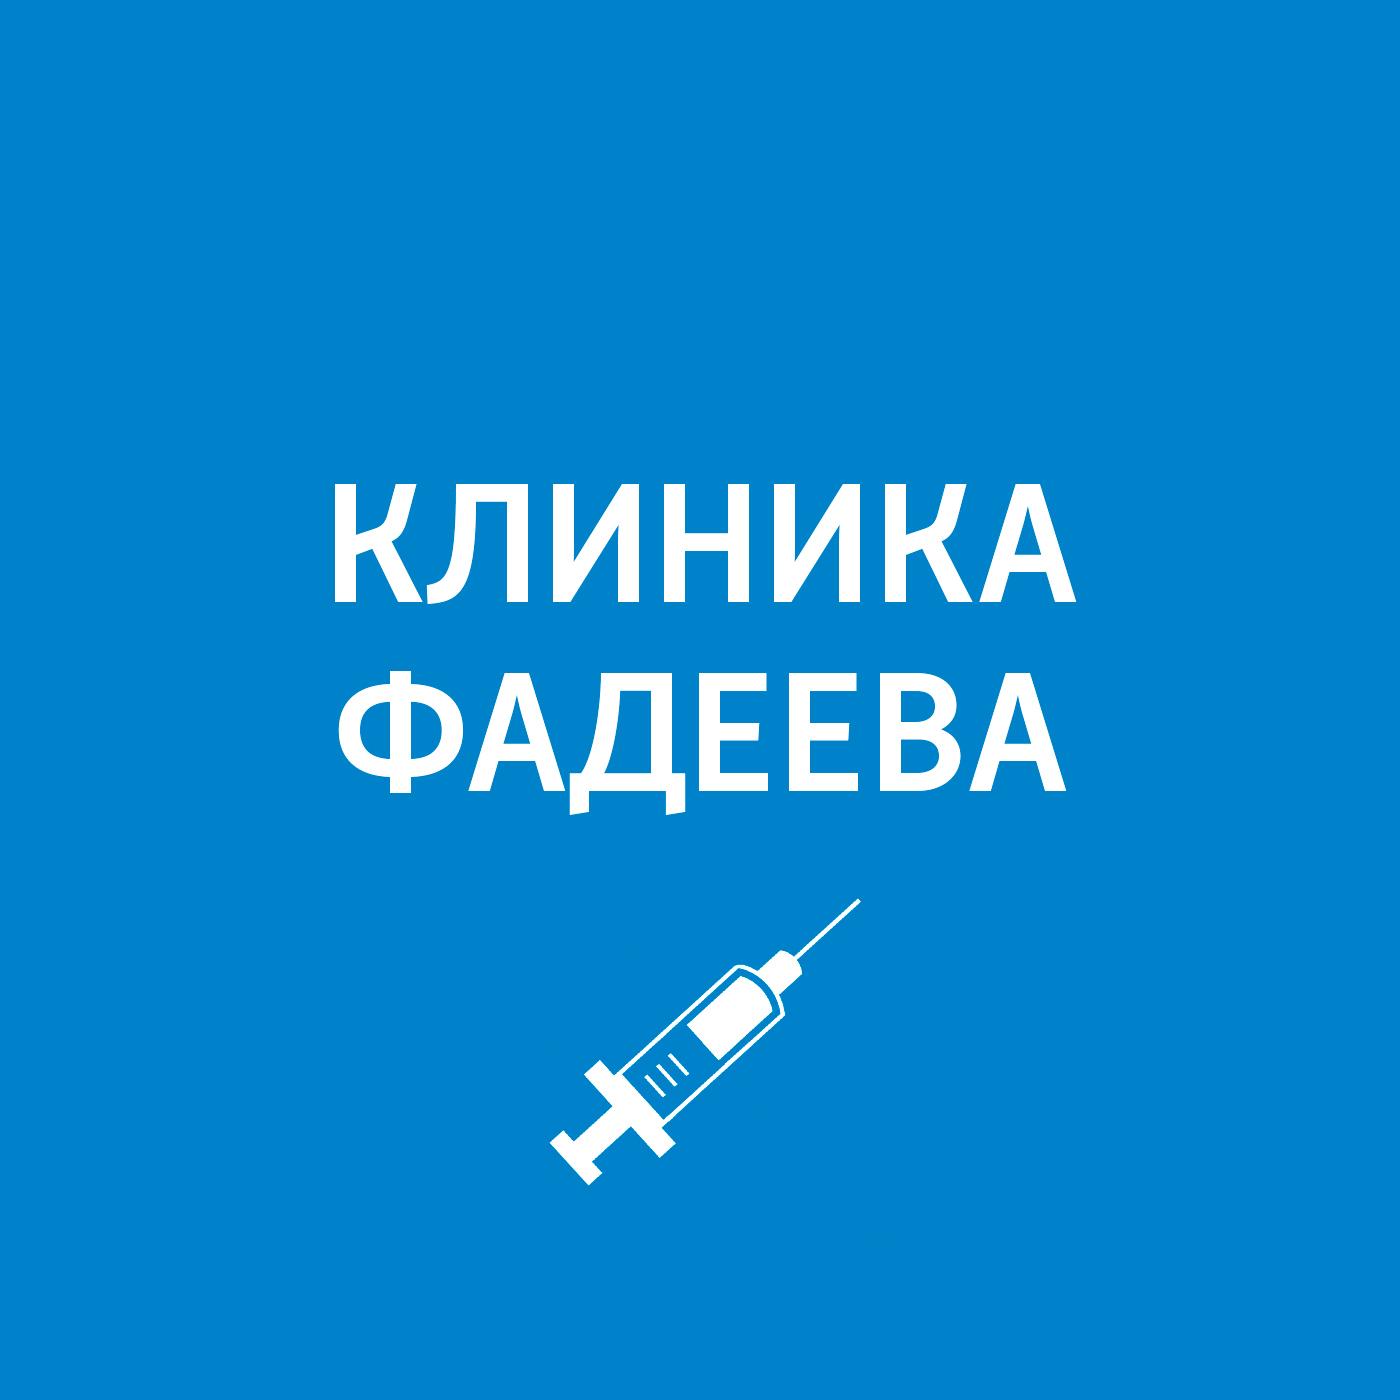 Фото - Пётр Фадеев Врач-пульмонолог пётр фадеев врач неотложной помощи